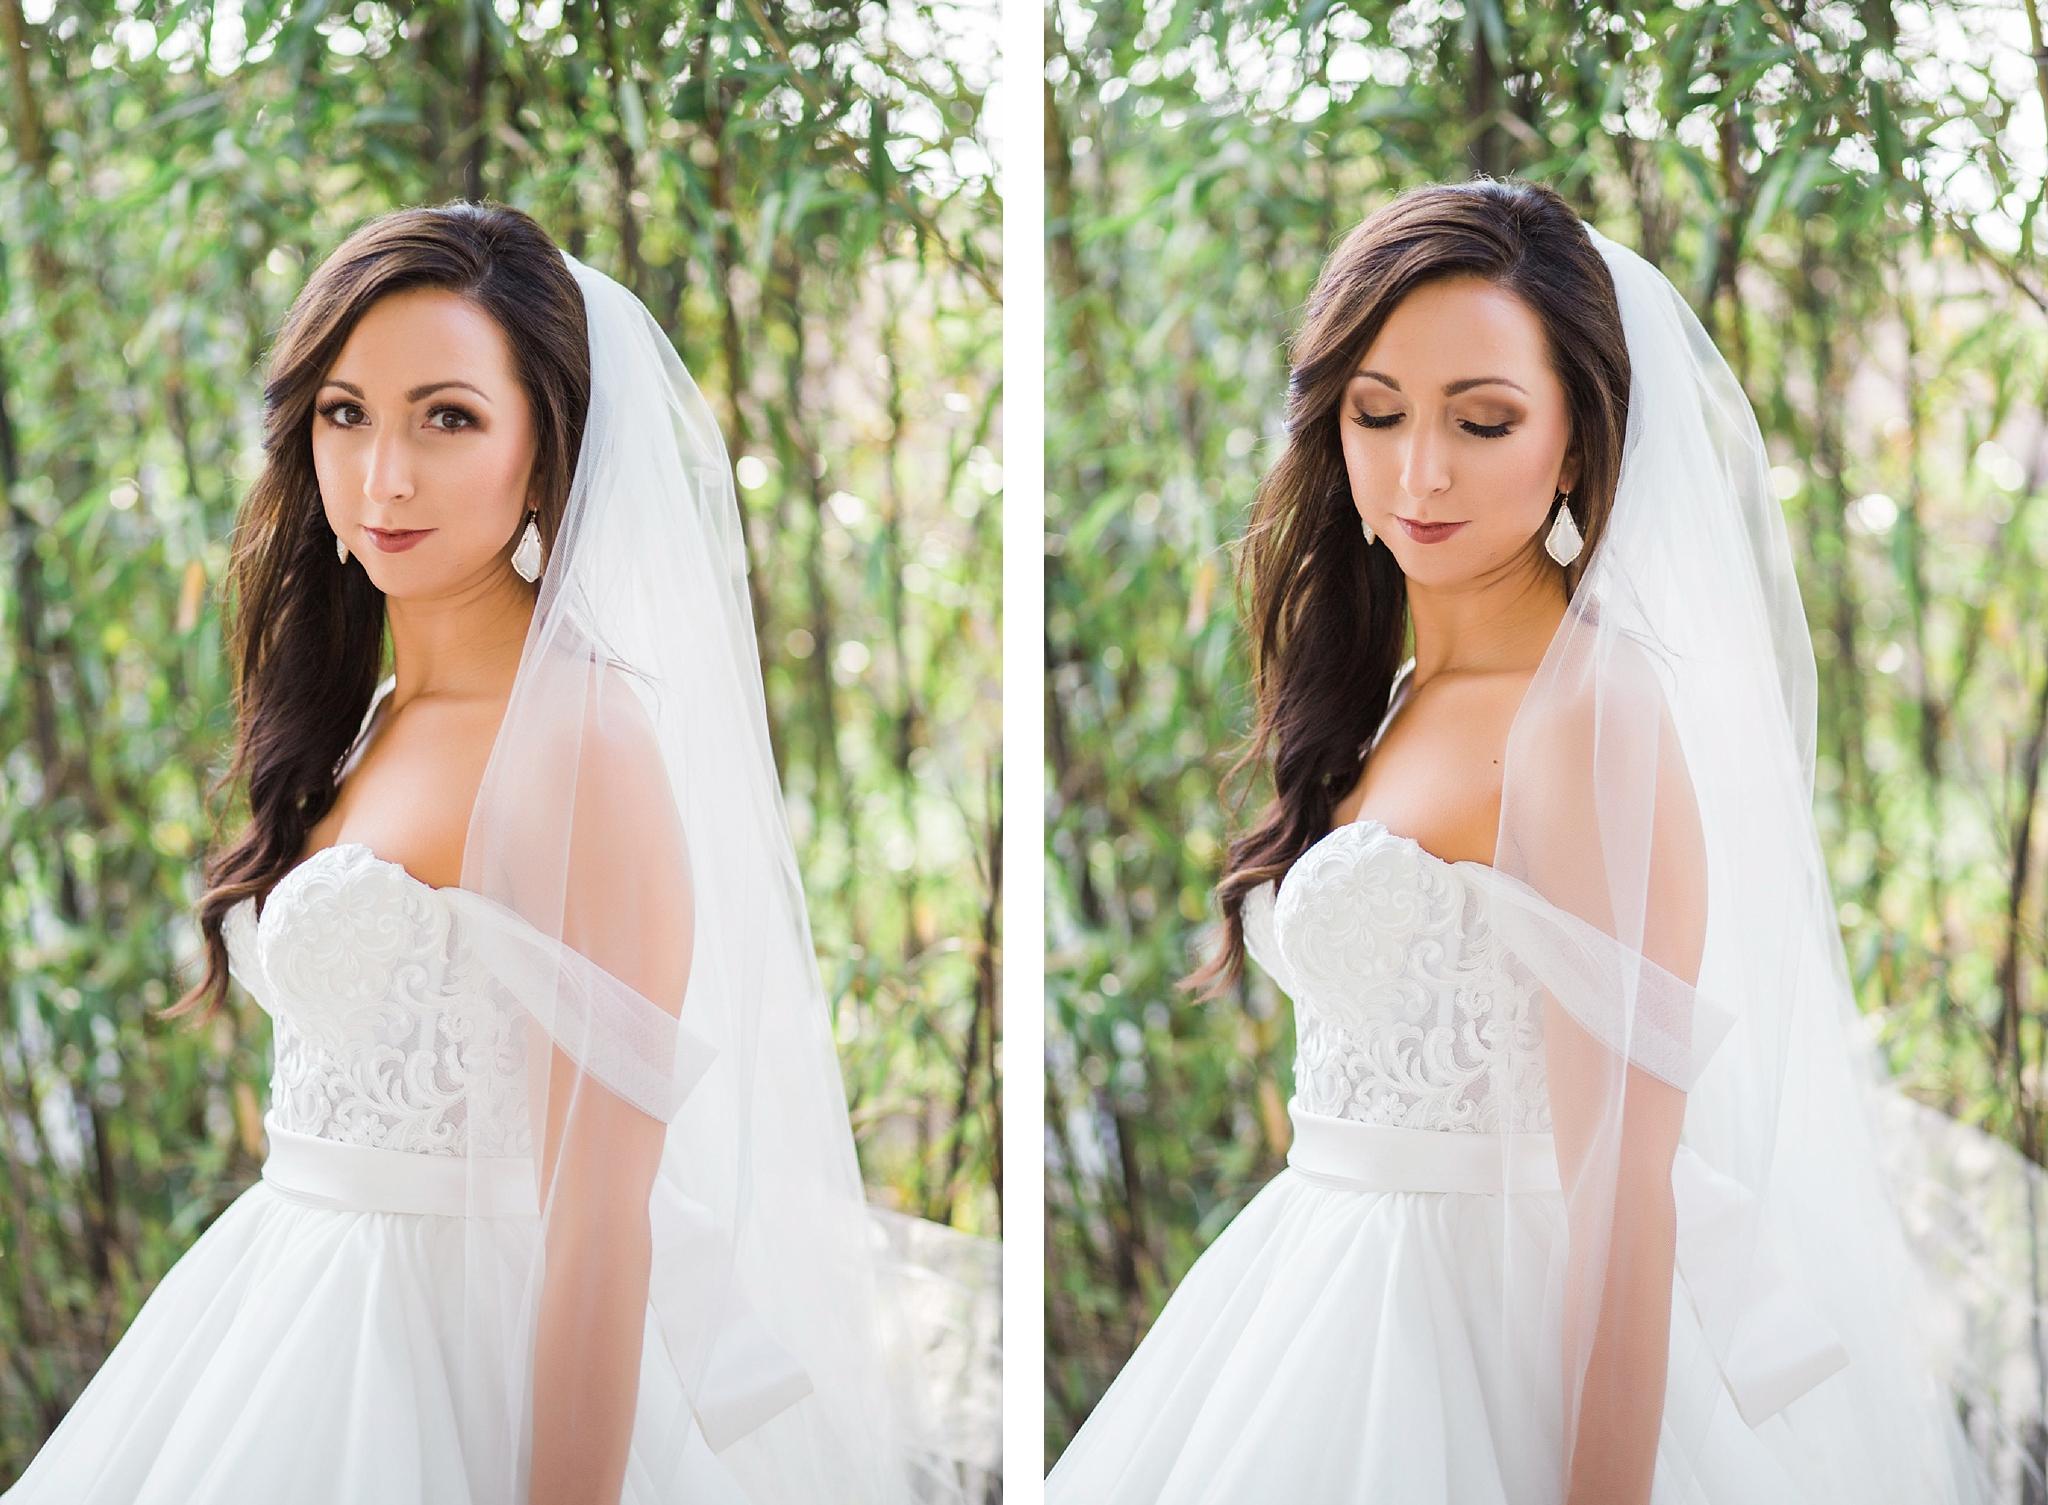 nashville-wedding-photographer-caley-newberry.jpg